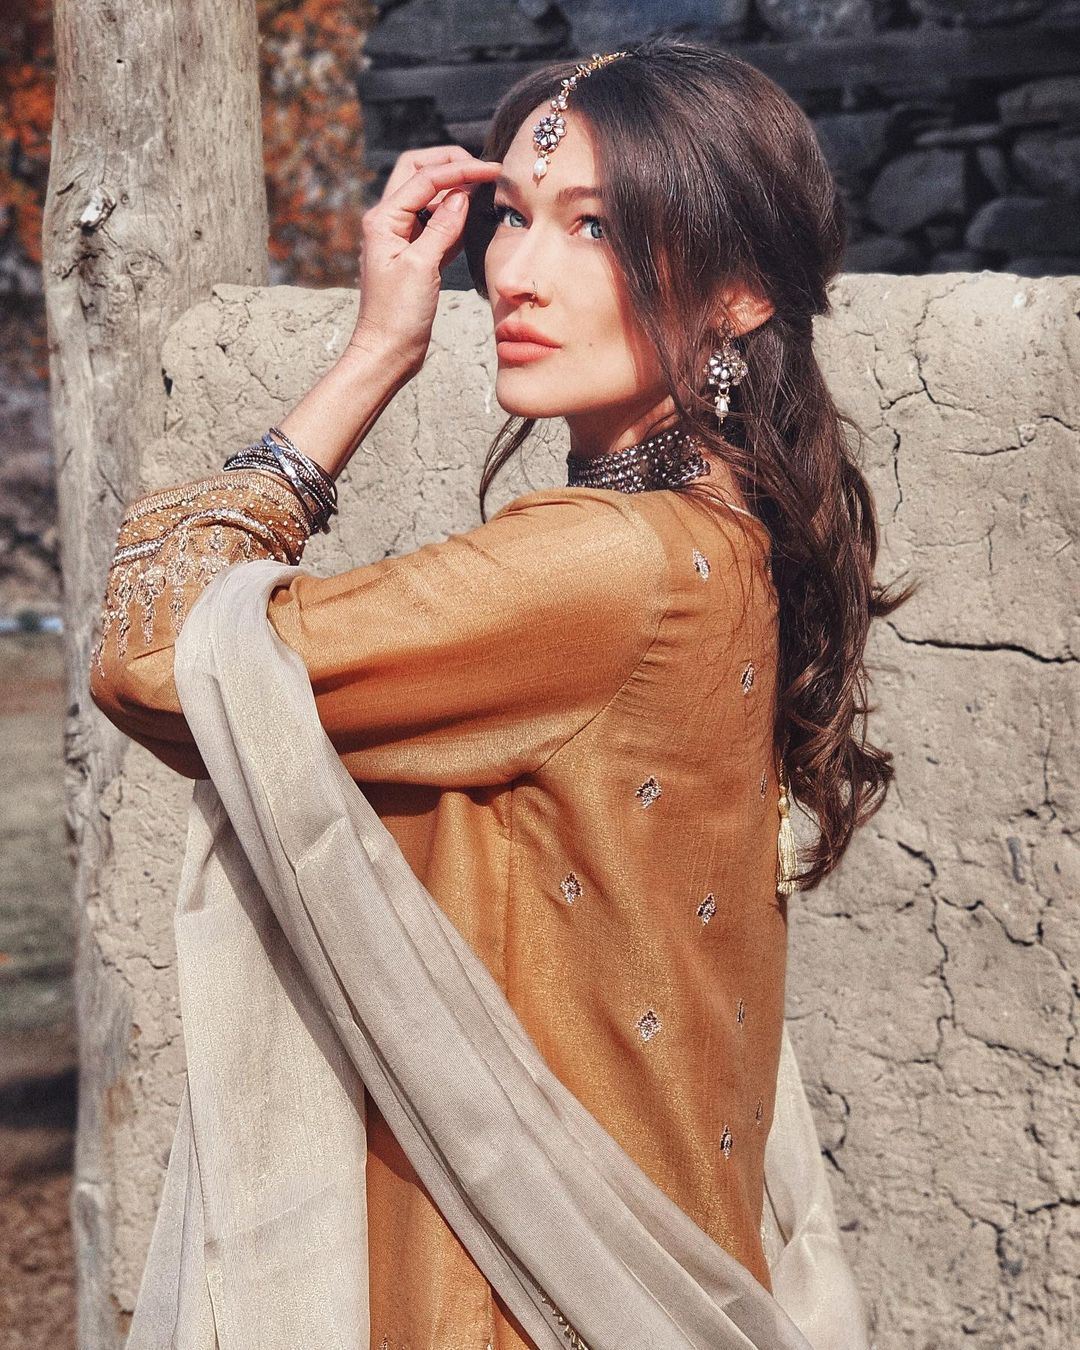 CHANGING MY NAME Rosie Gabrielle in Pakistan / @rosiegabrielle